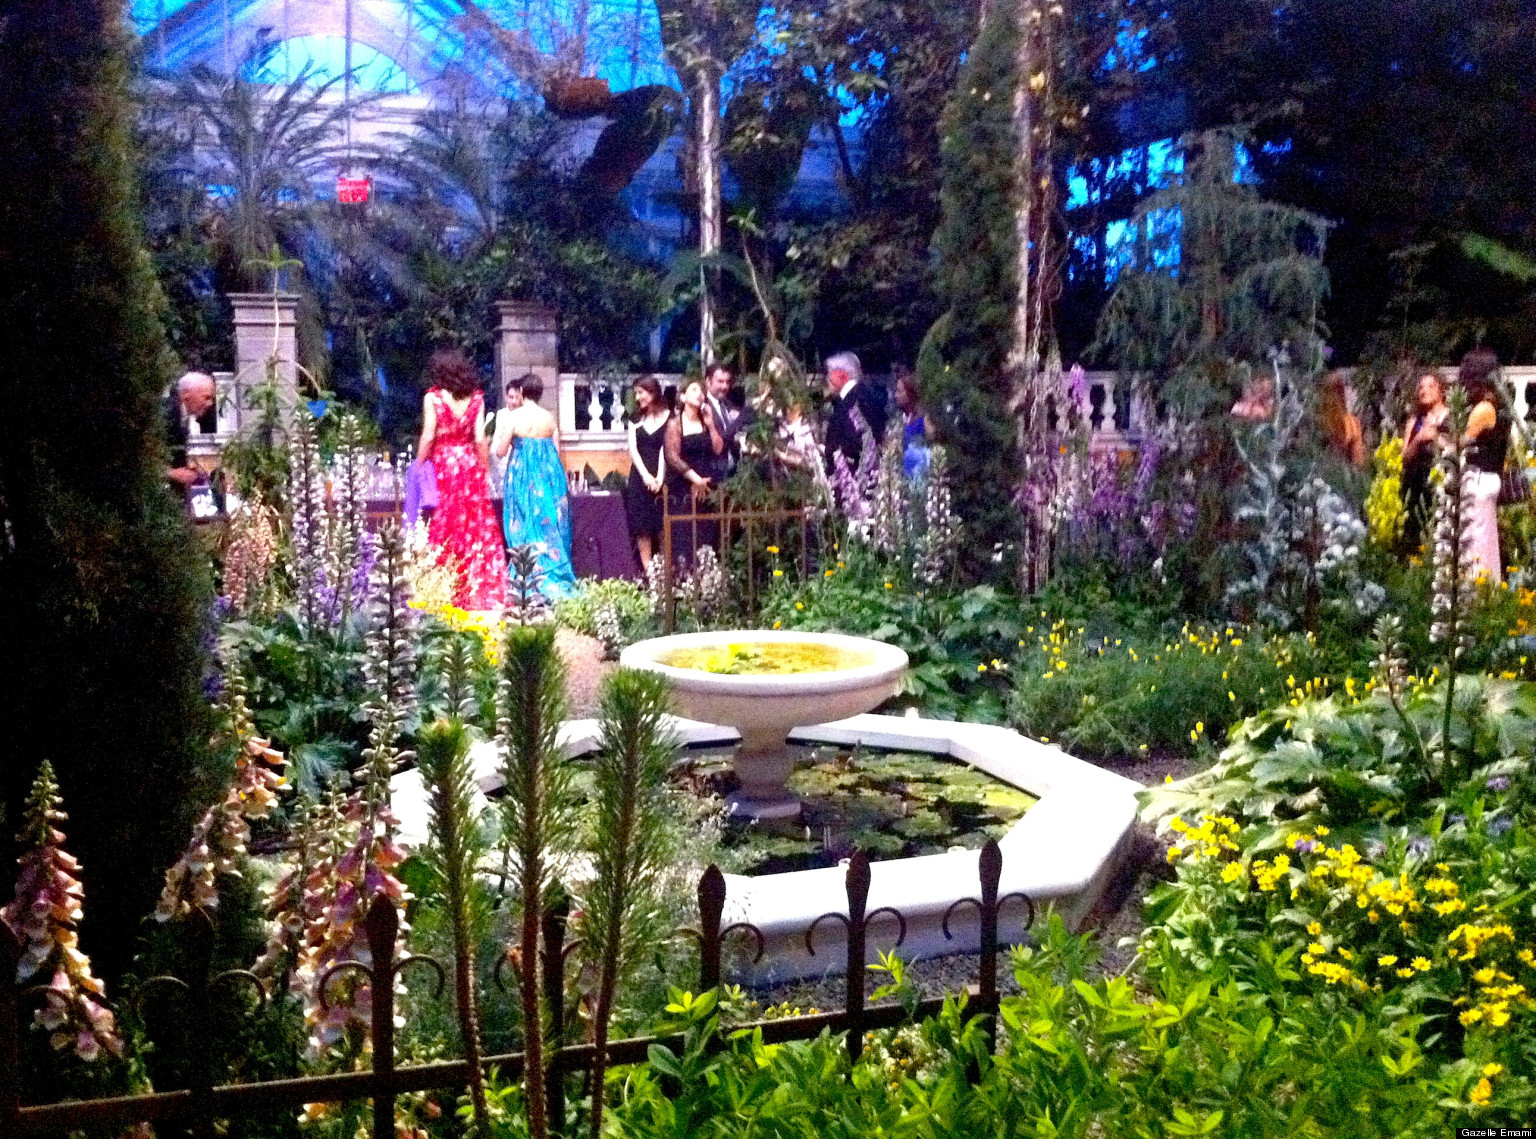 New York Botanical Garden Conservatory Ball 2013: An tout Opbouw Tuinhuis Gardenas New York